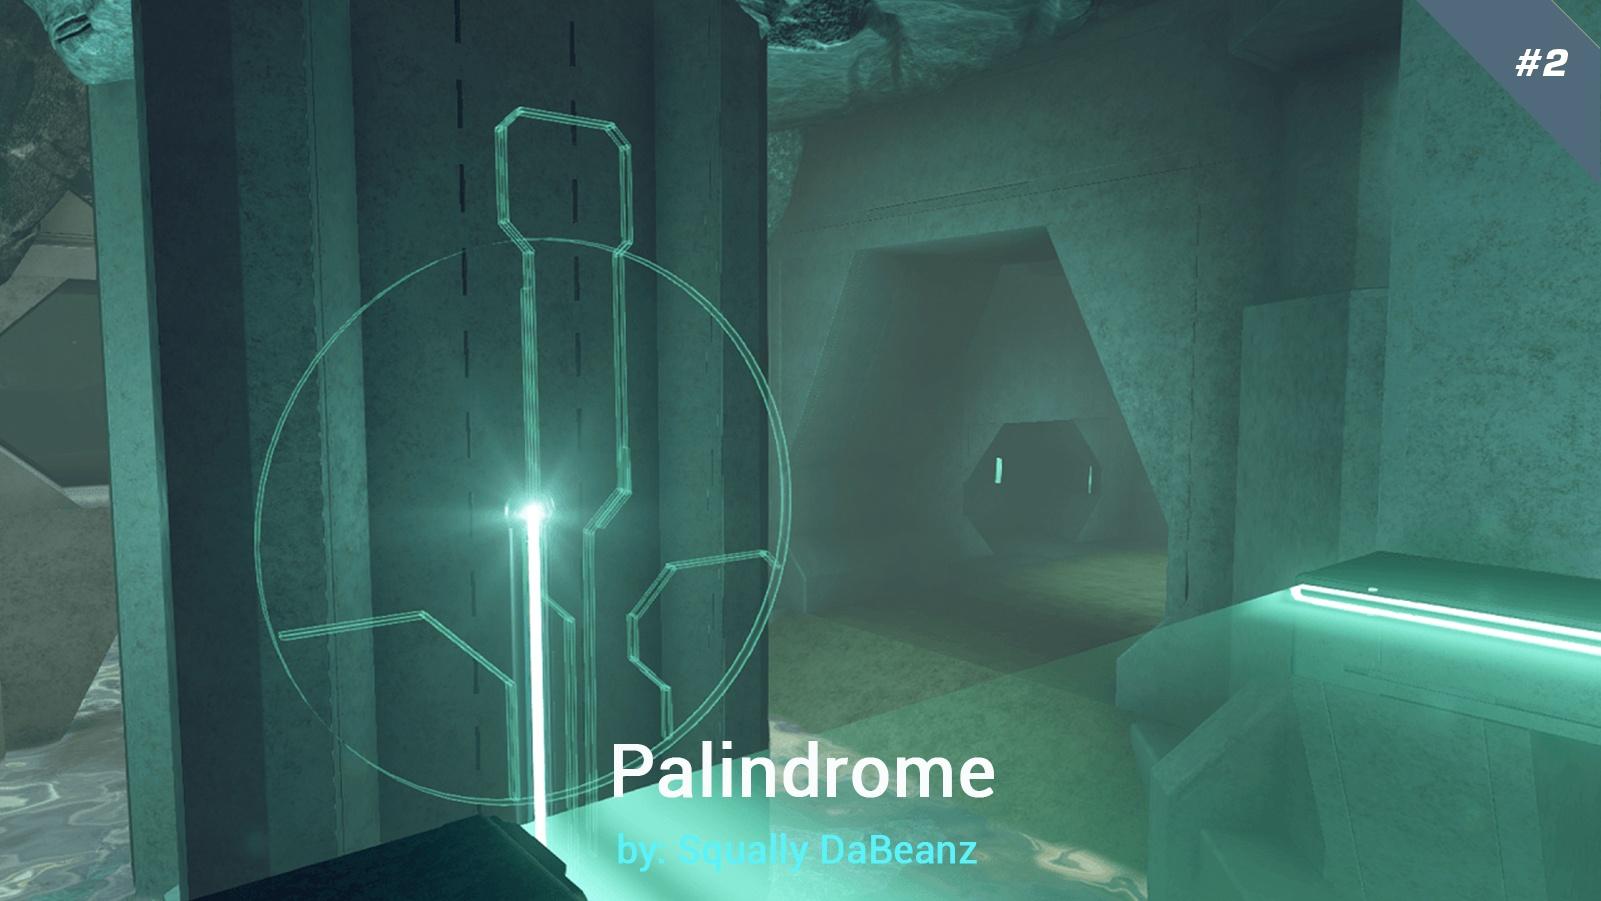 Palindrome1.jpg